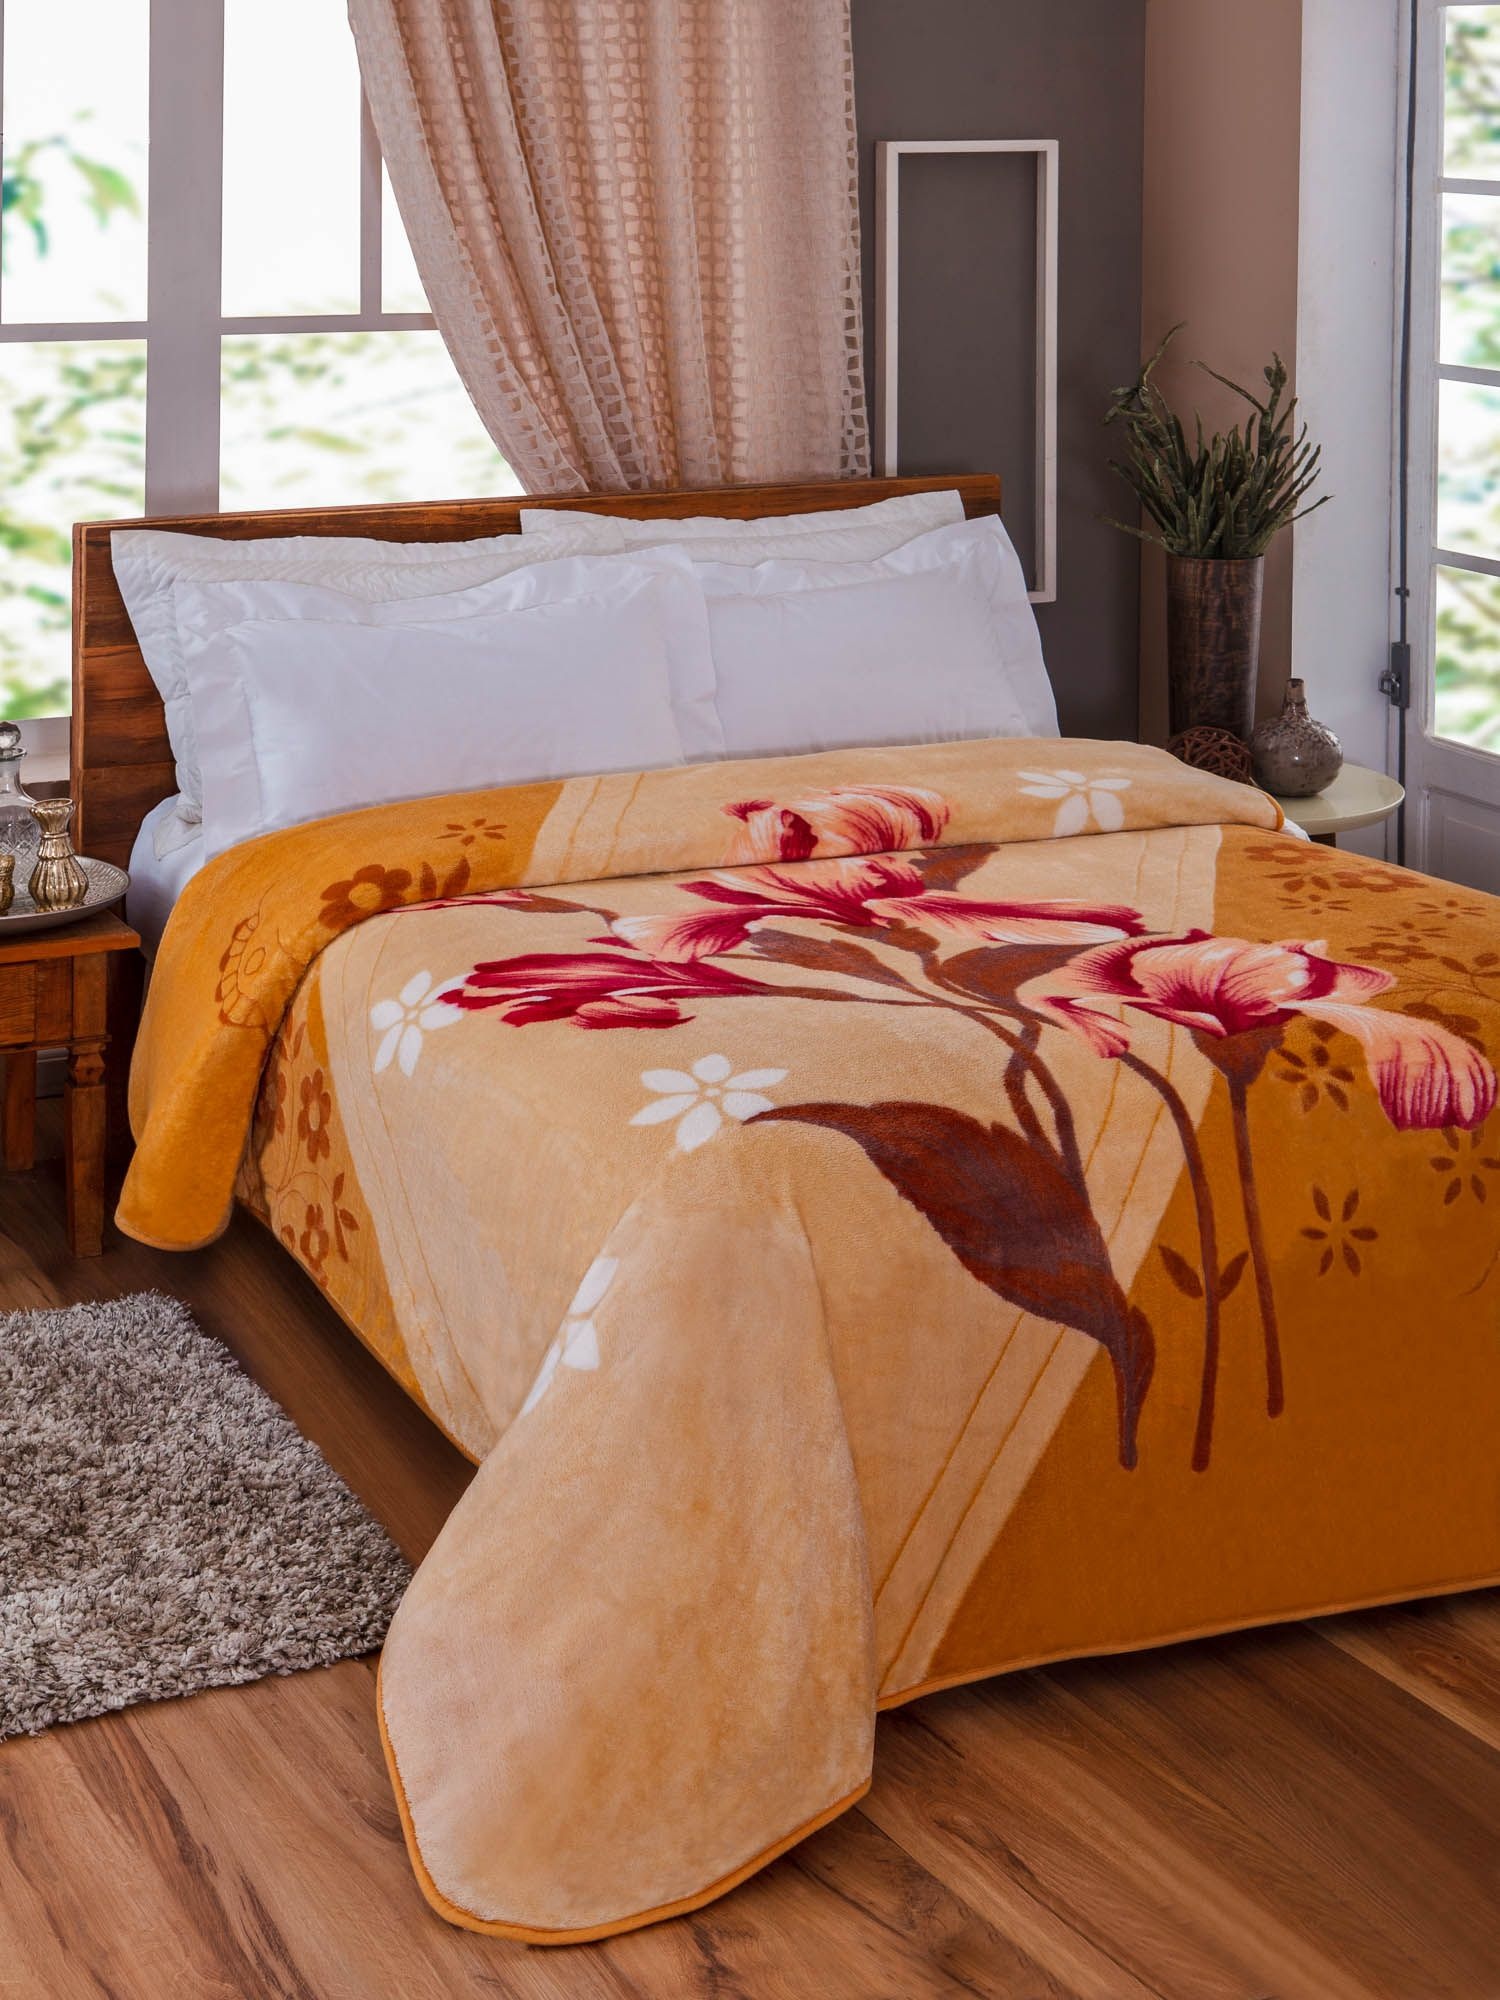 Cobertor Microfibra Jolitex Orquideas Kyor Plus Casal 1,80 m x 2,20 m